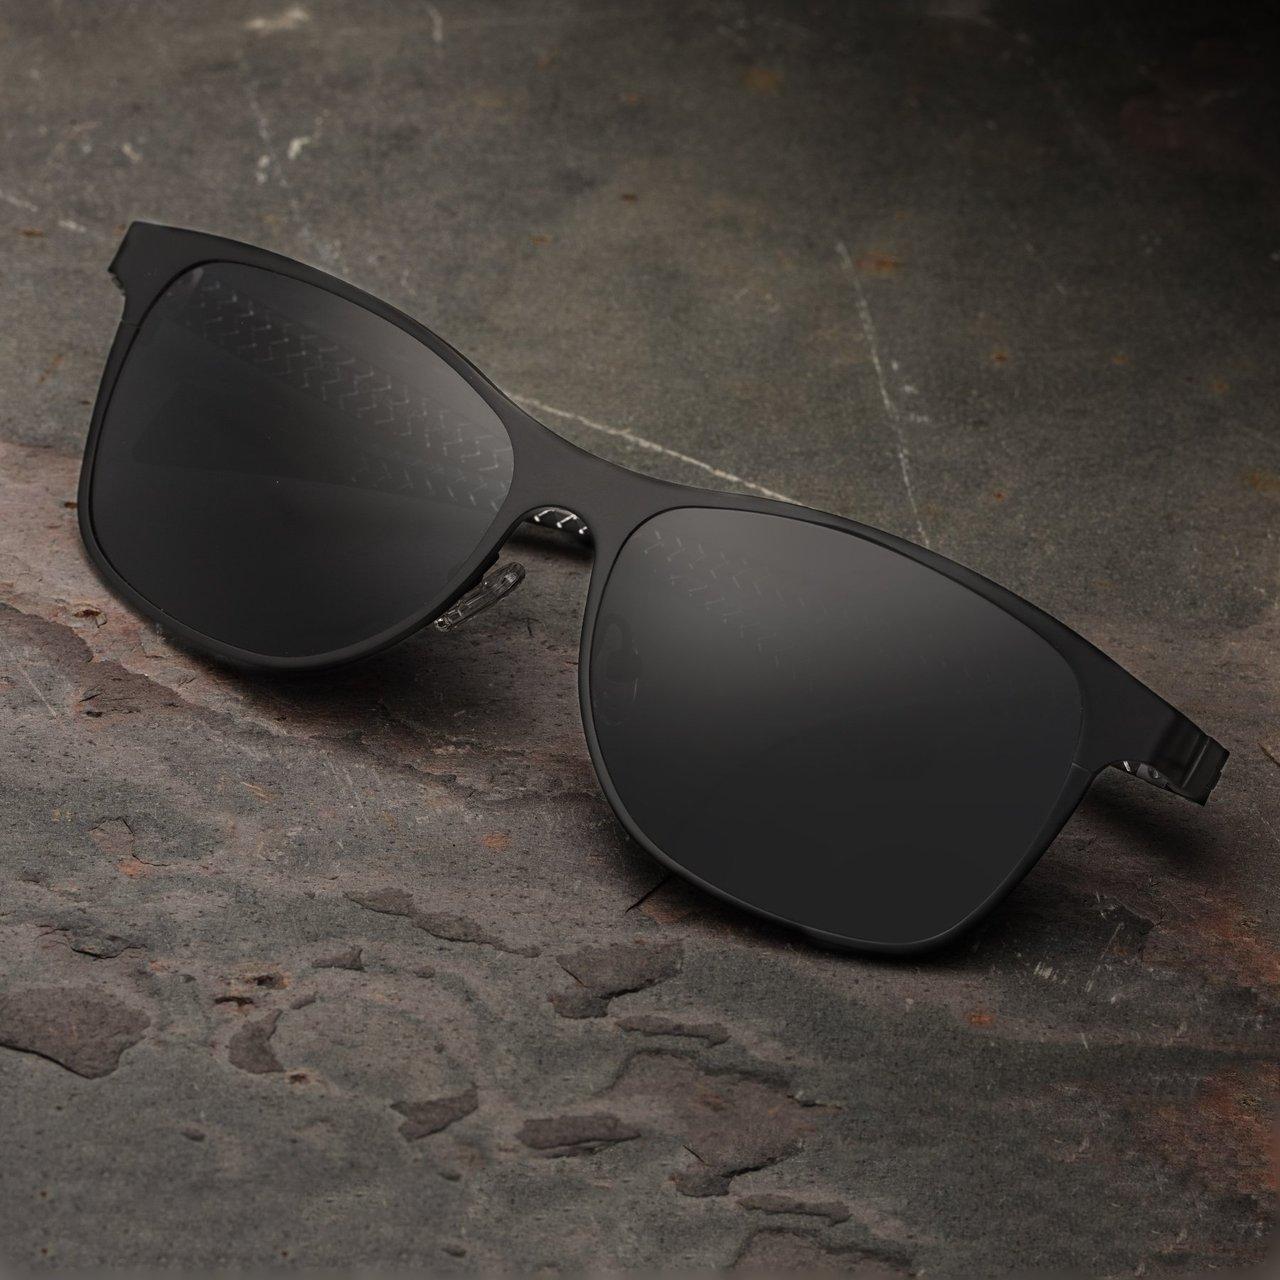 Breed Templar Black Titanium Sunglasses with Carbon Fiber Arms